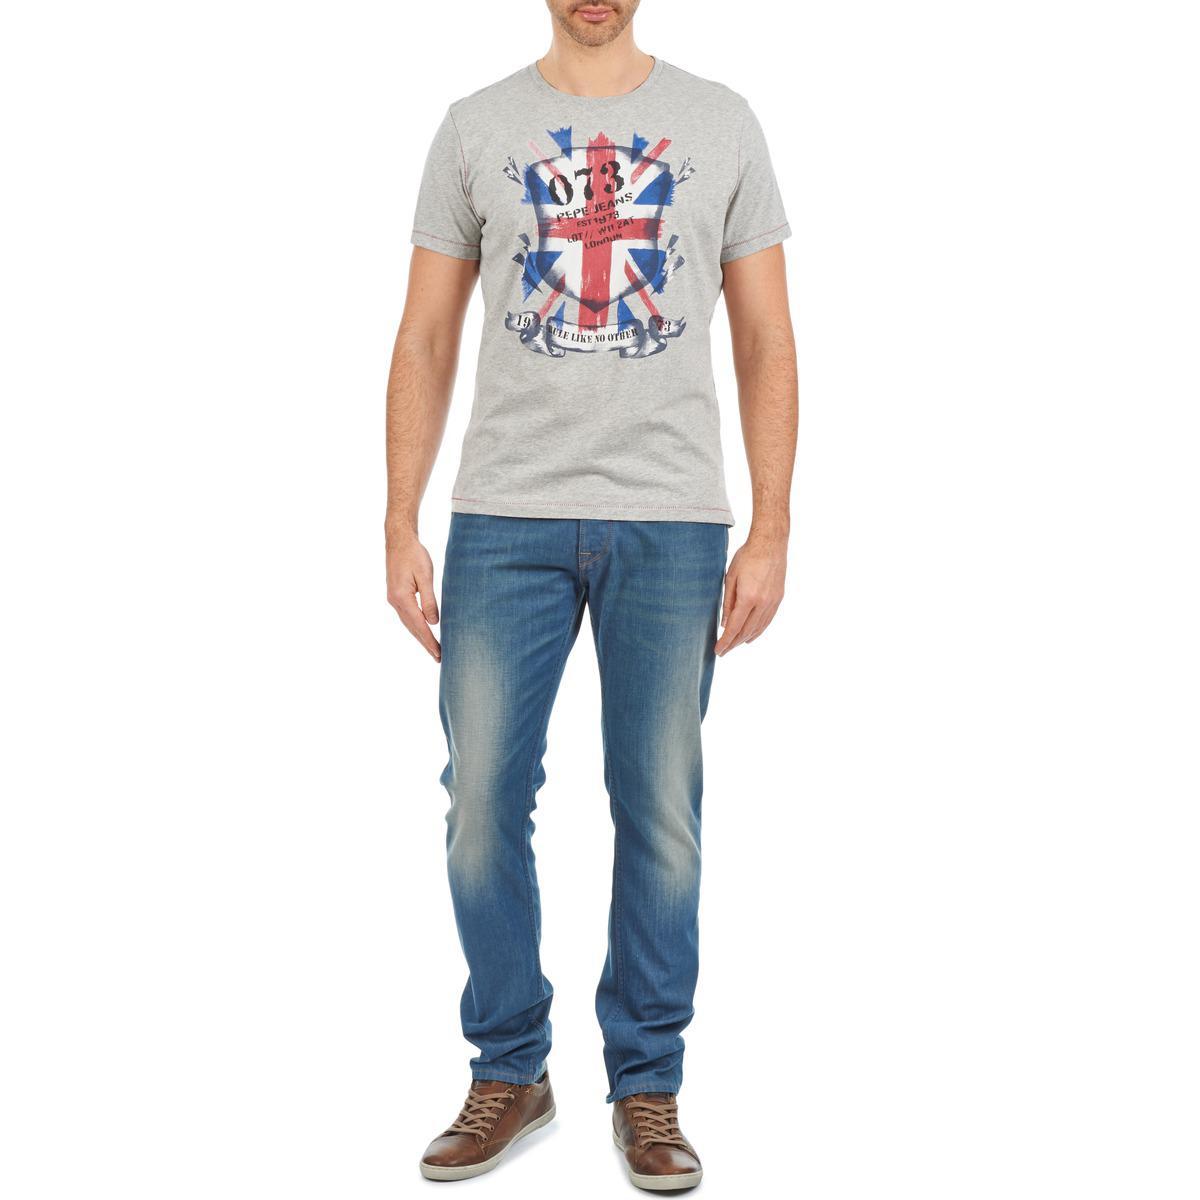 26b84a53e11 Pepe Jeans - Spike Men s Skinny Jeans In Blue for Men - Lyst. View  fullscreen